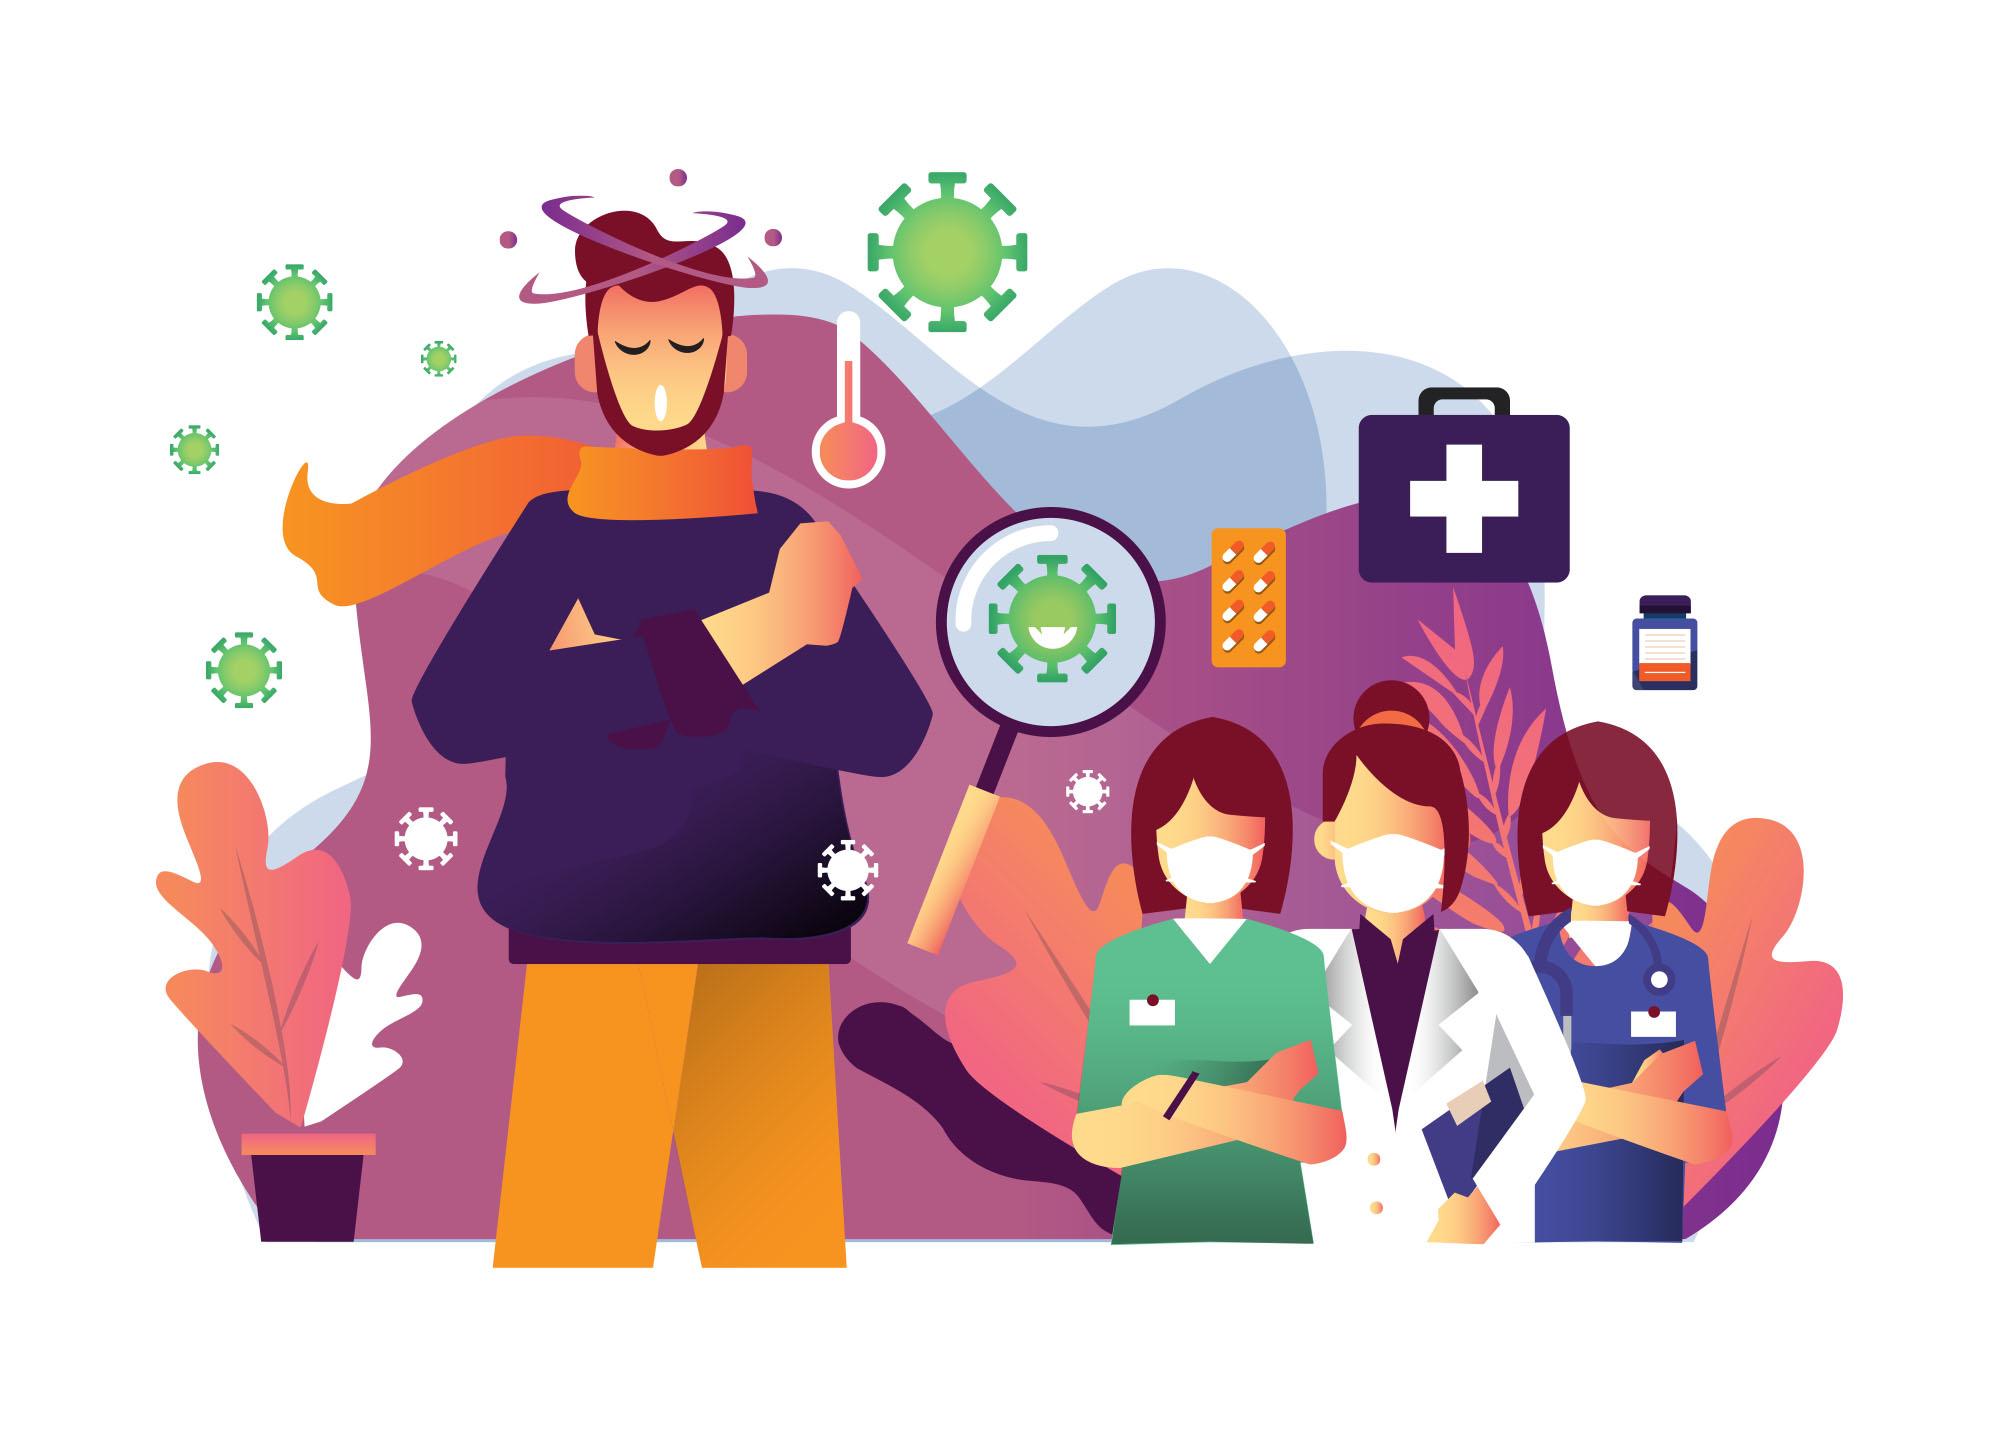 Pandemic Illustration